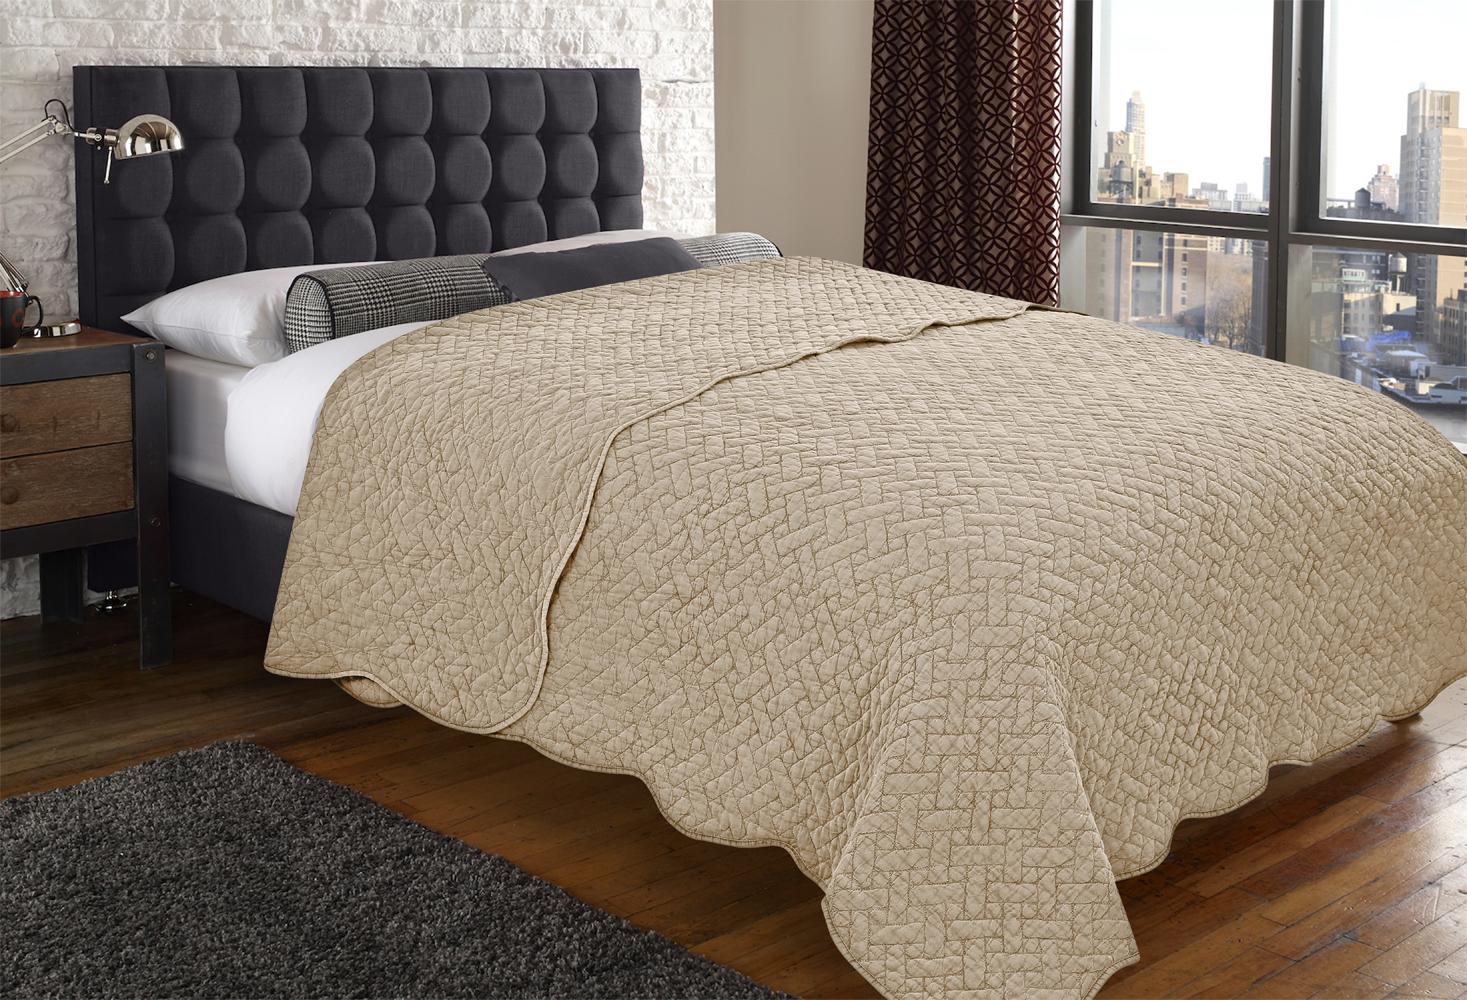 Купить Пледы и покрывала Amore Mio, Покрывало Olivette(220х240 см), Китай, Синтетический сатин